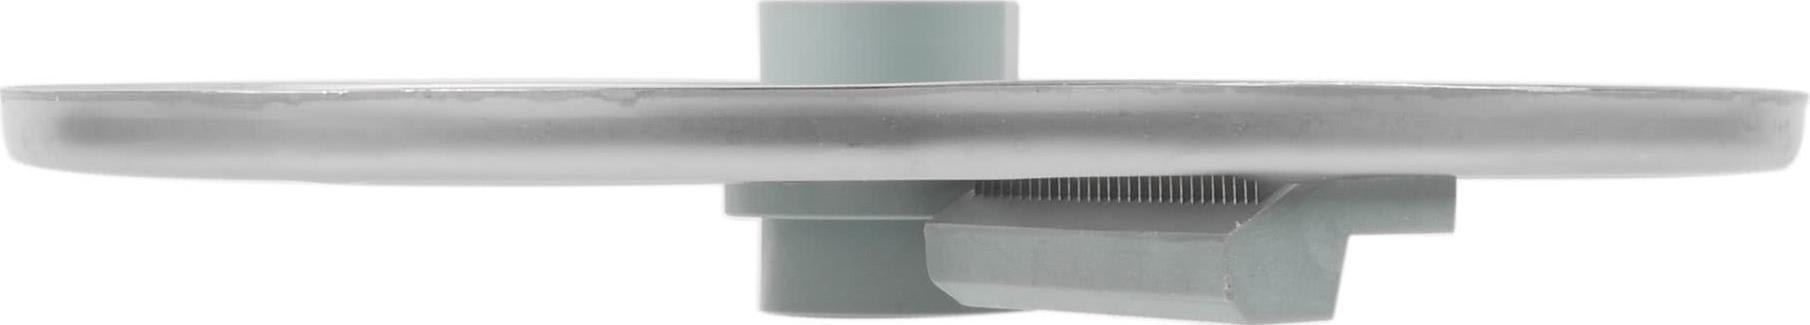 Диск-соломка Robot Coupe 27599 (2x2 мм) - 2